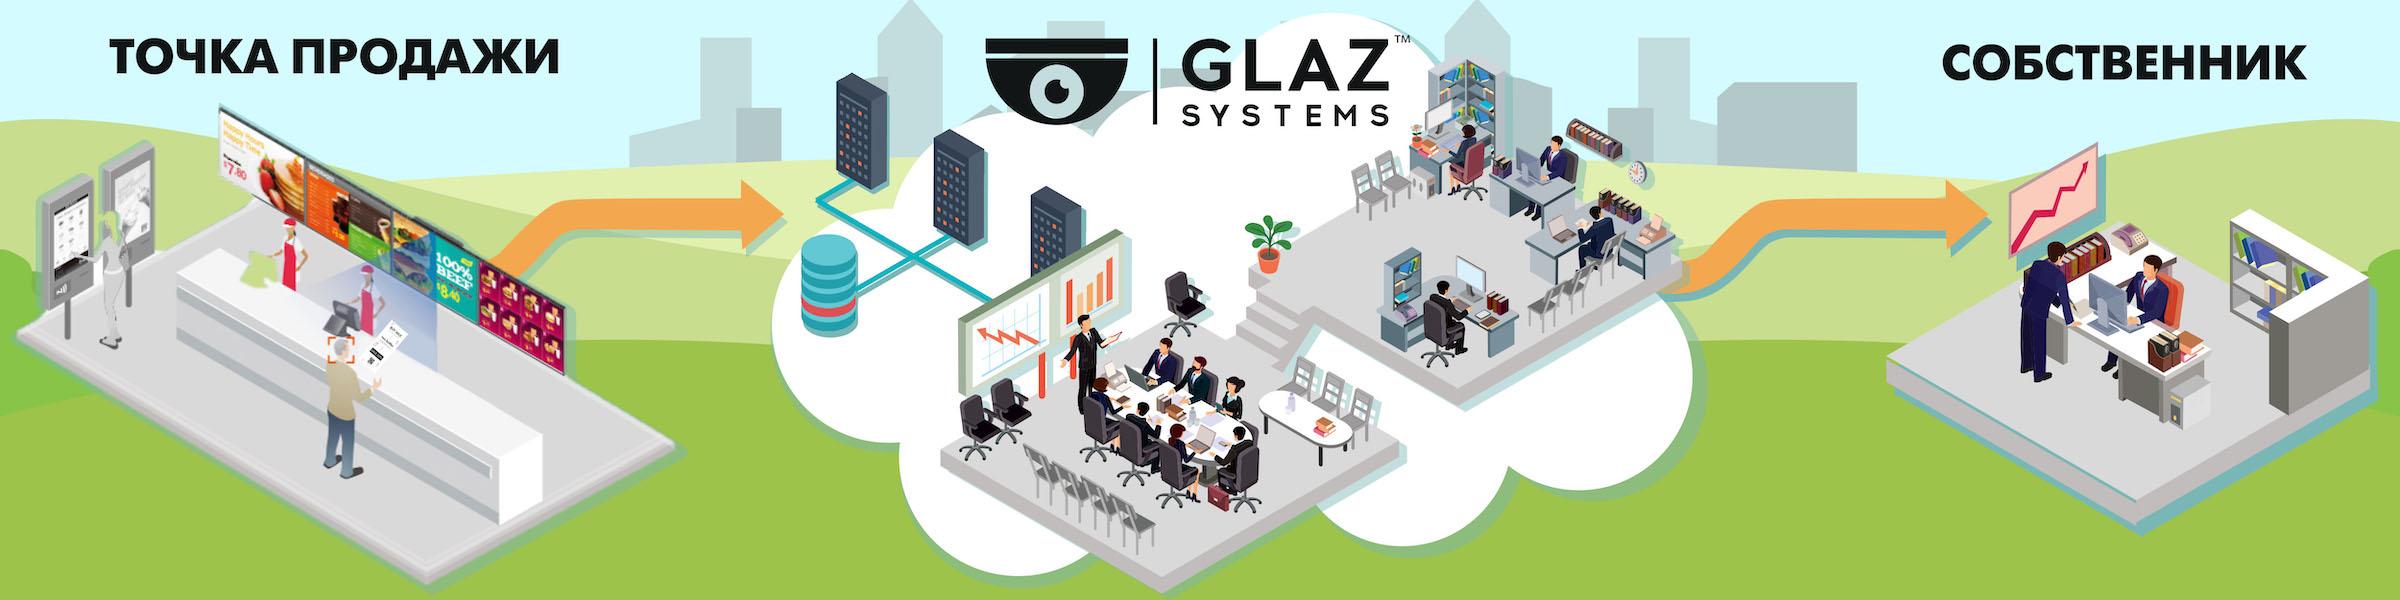 Glaz.Systems